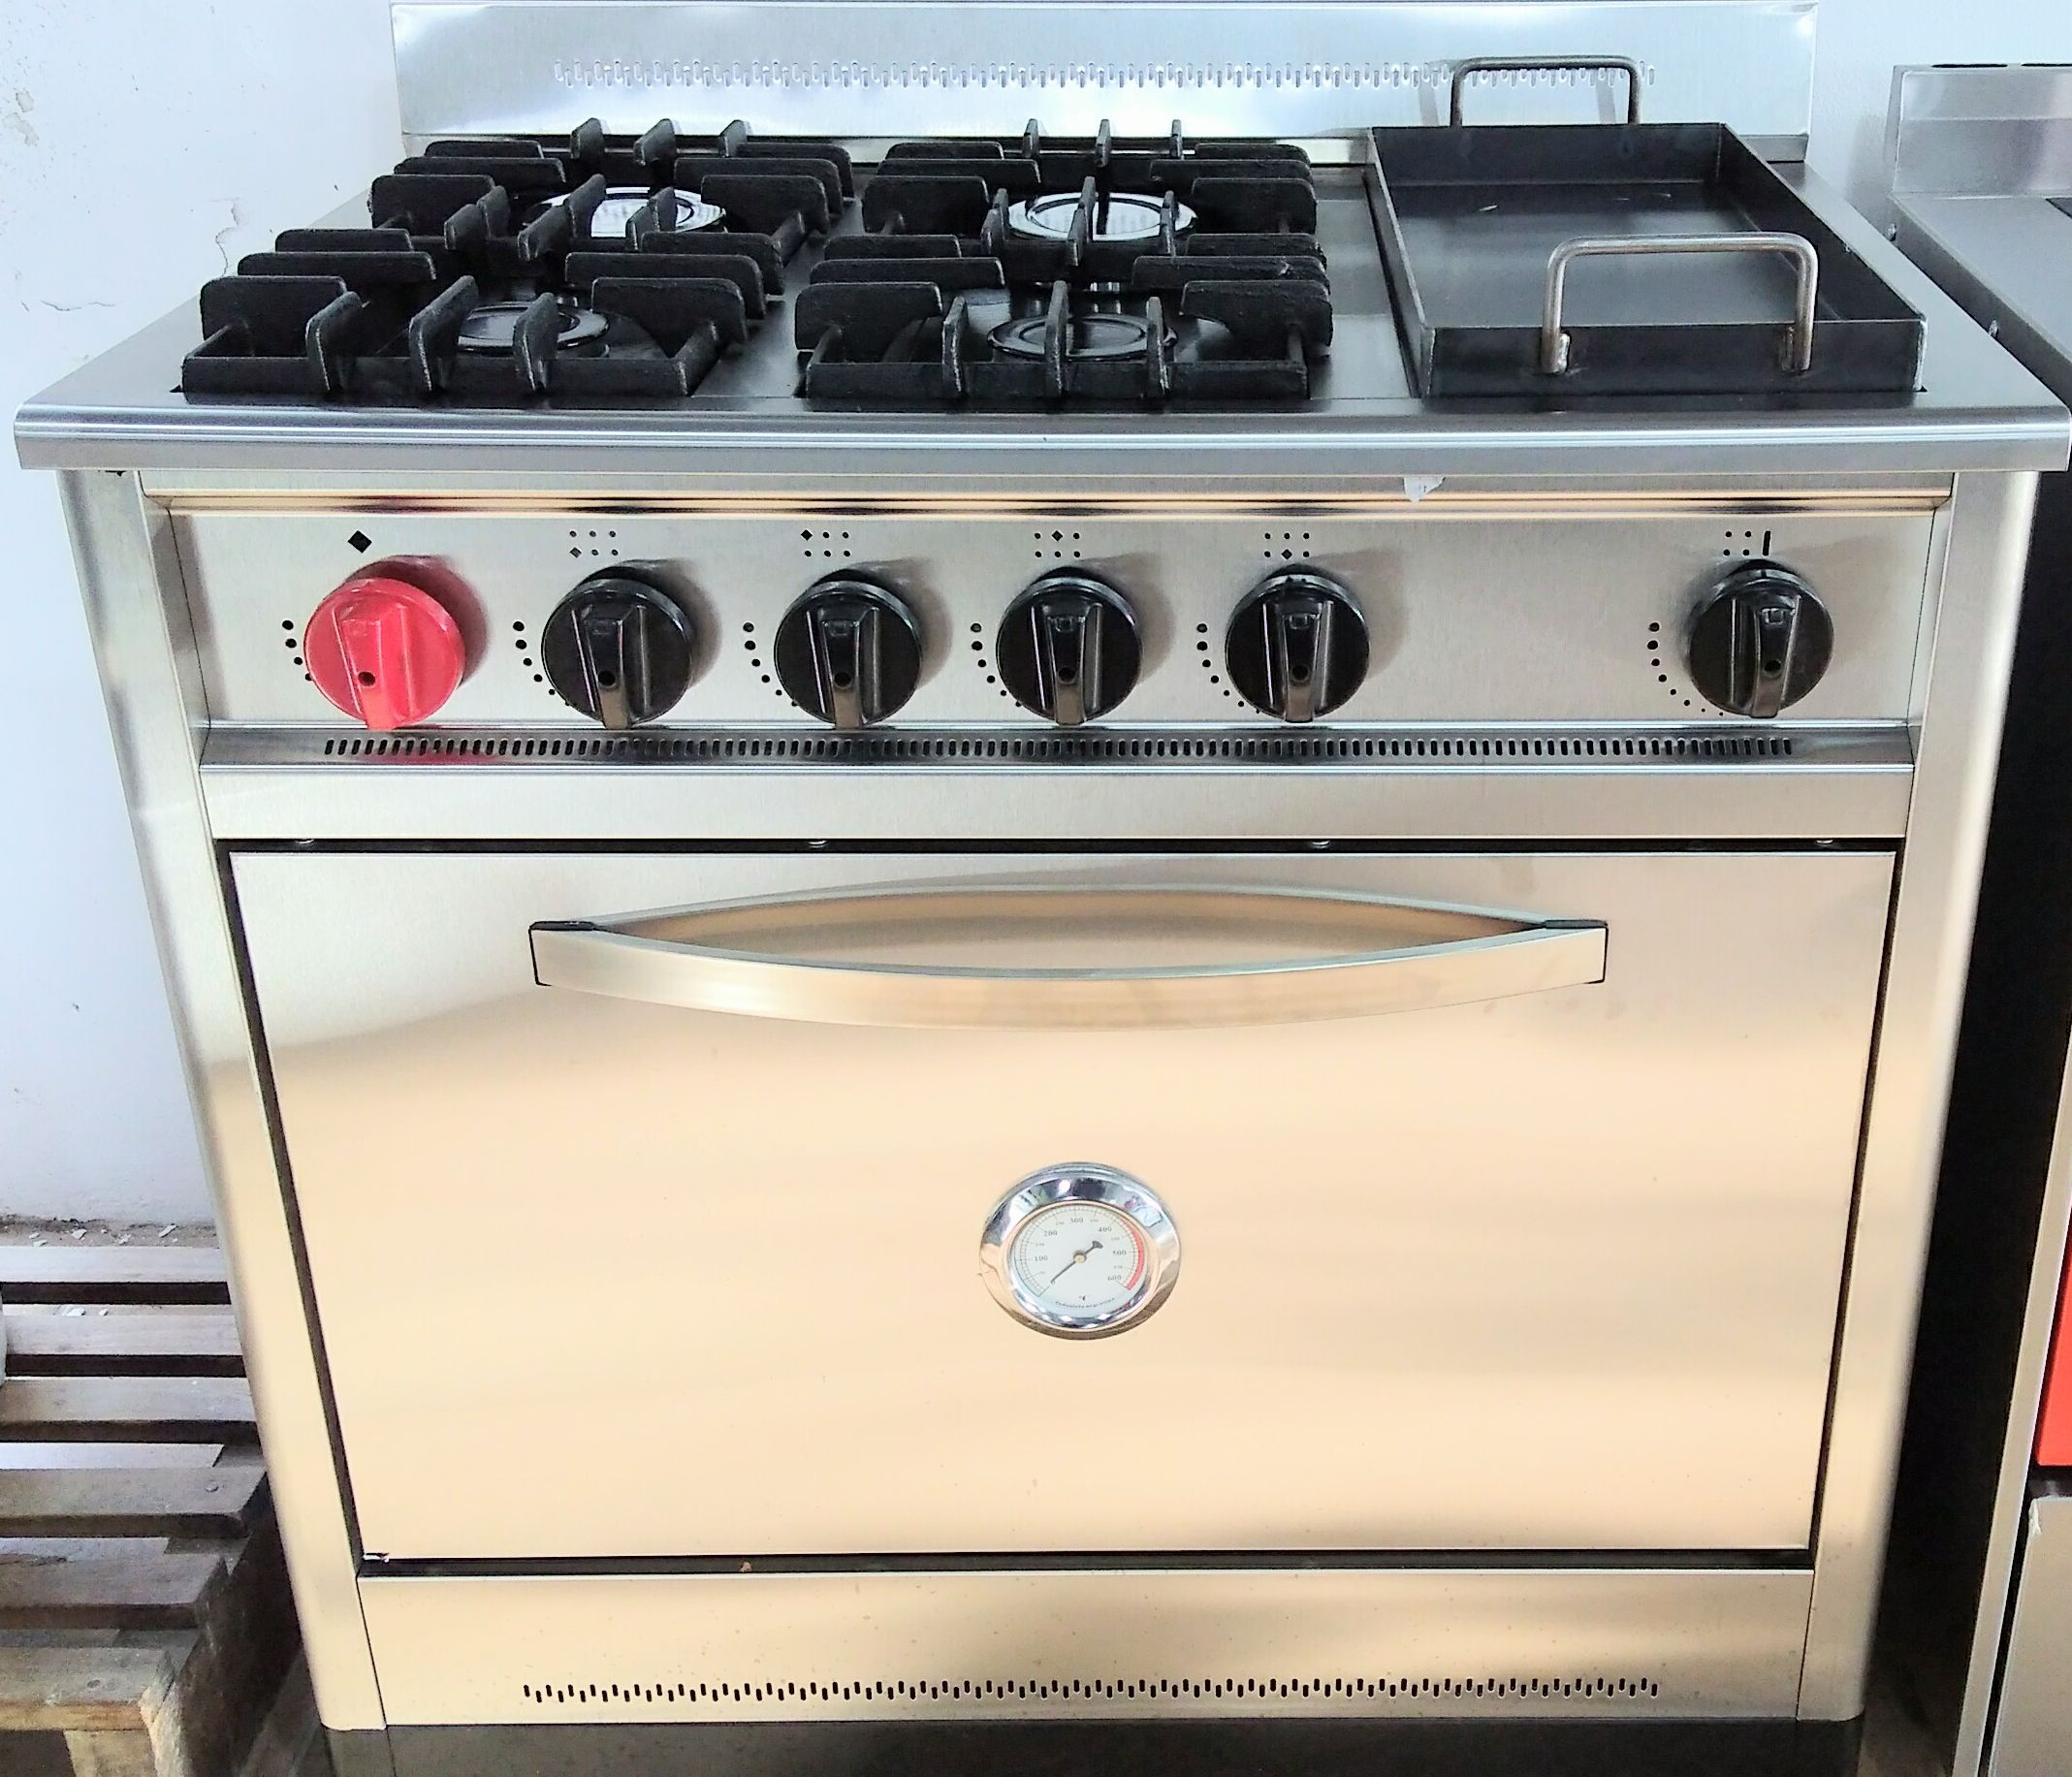 Cocina ares 90cm con plancha incorporada casa eduardo - Cocinas con plancha incorporada ...